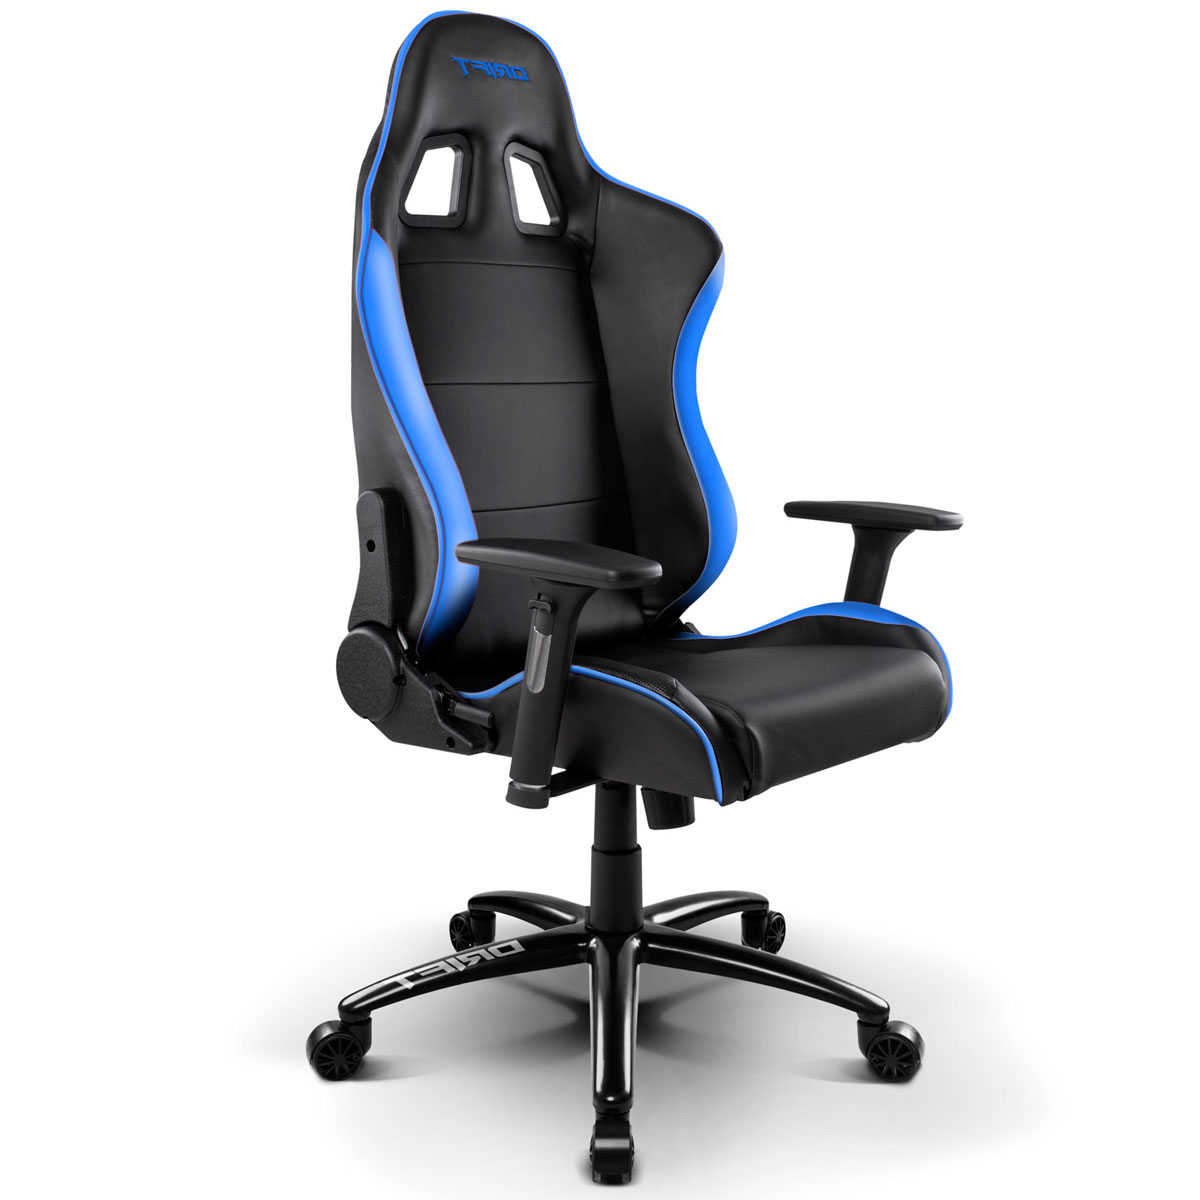 gaming chair pc ergonomic repair silla polipiel drift dr200 negro y azul - versus gamers